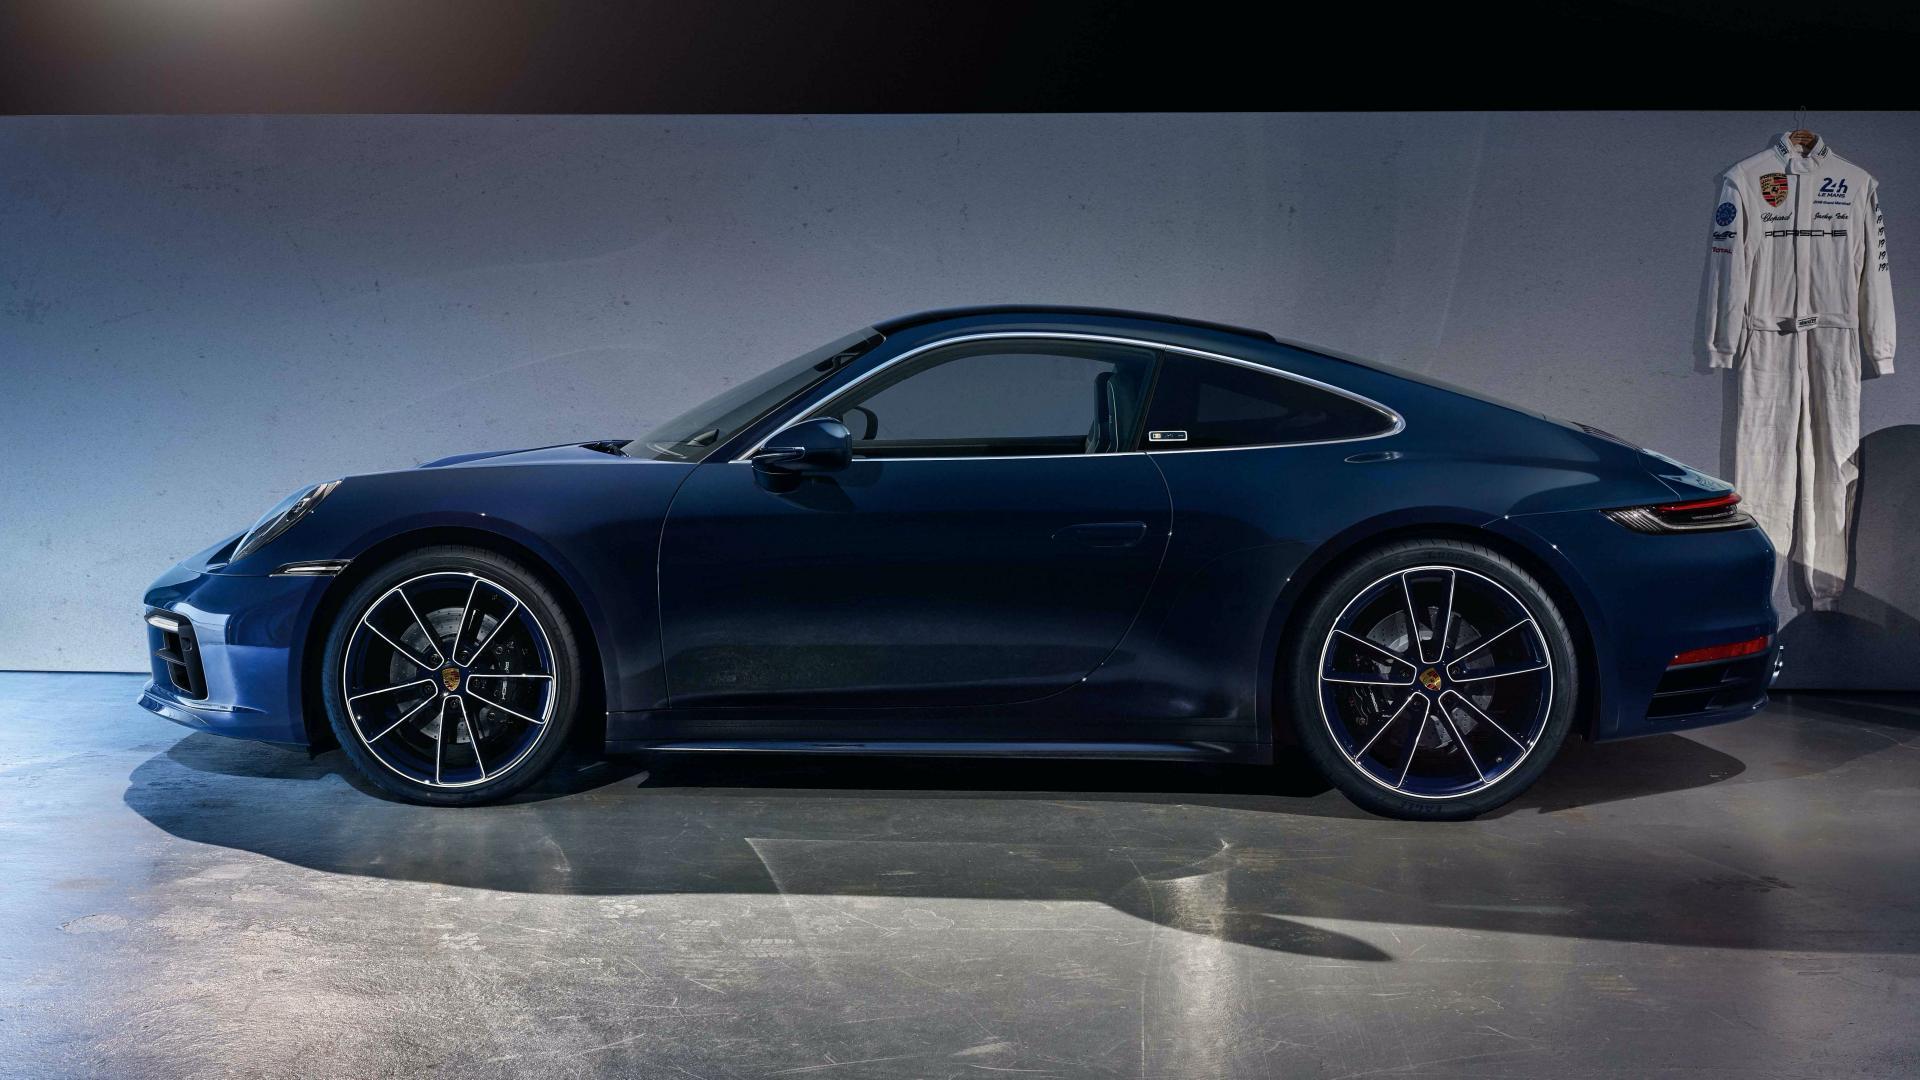 Porsche-911-Belgian-Legend-Edition-2020-Jacky-Ickx-10